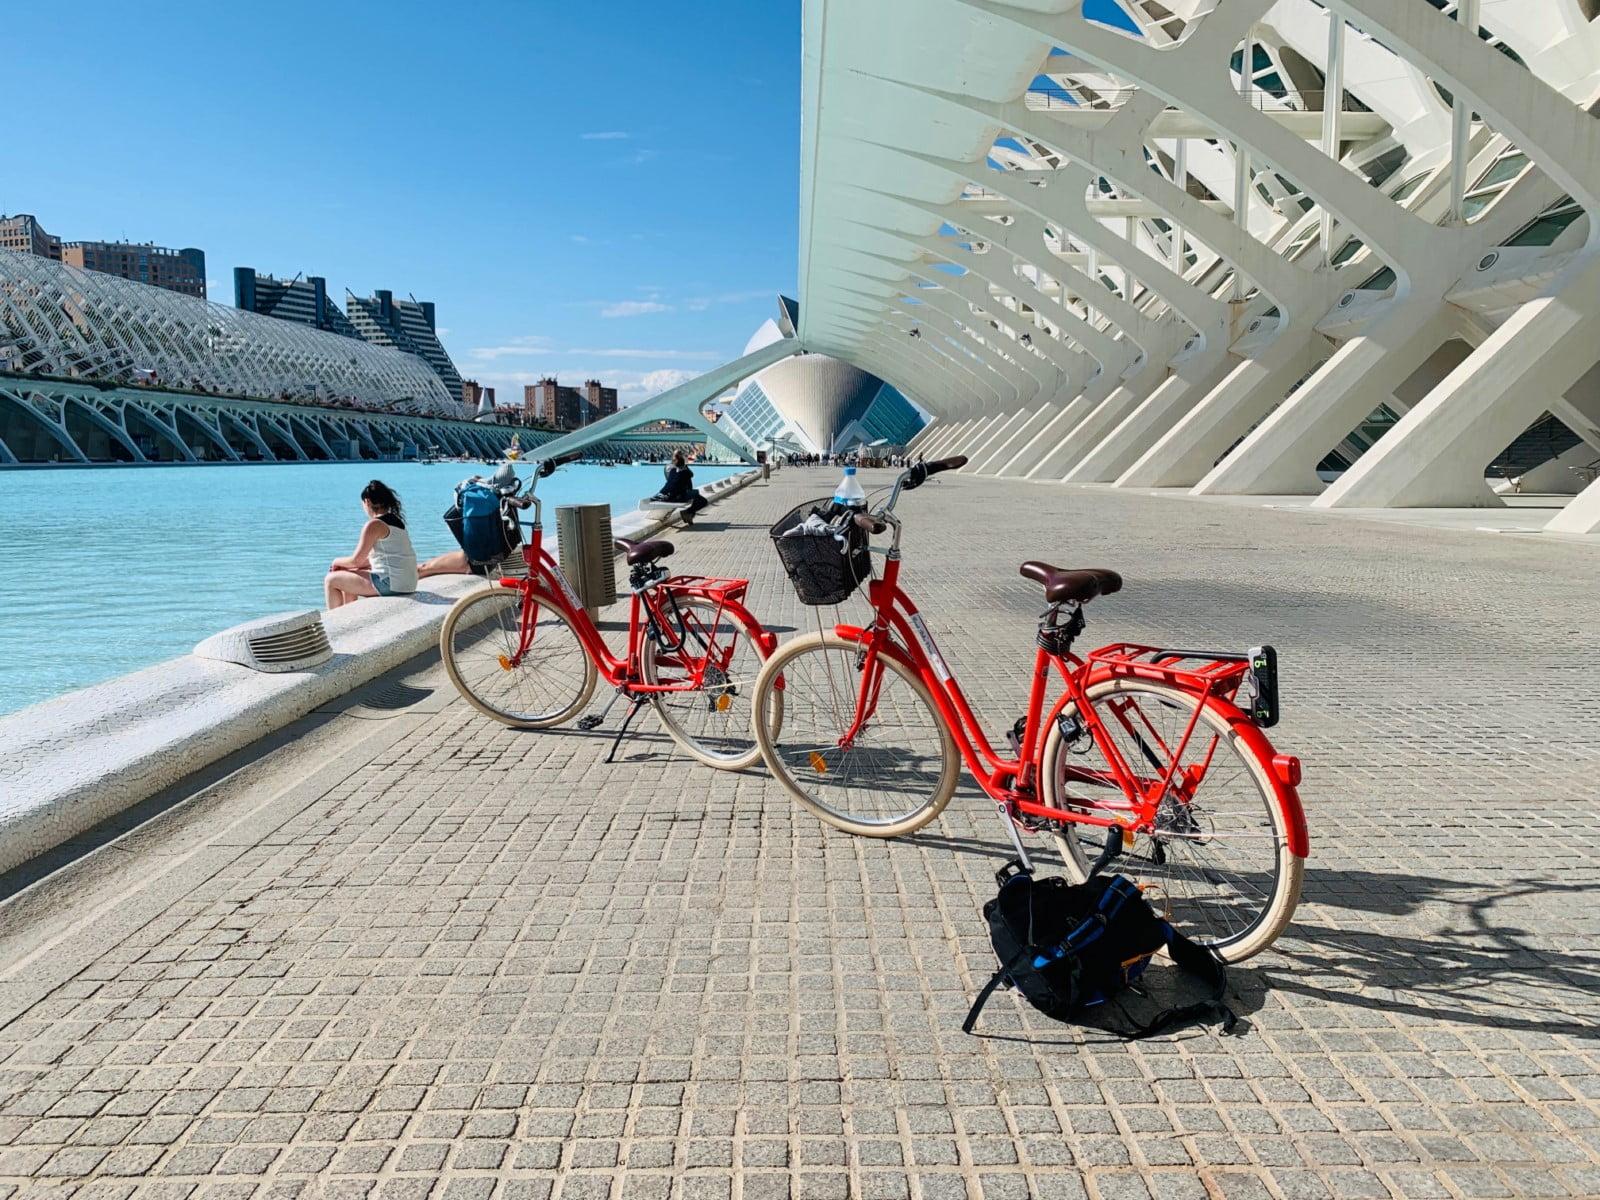 Visita Valencis con bicicleta. Bike tour Valencia